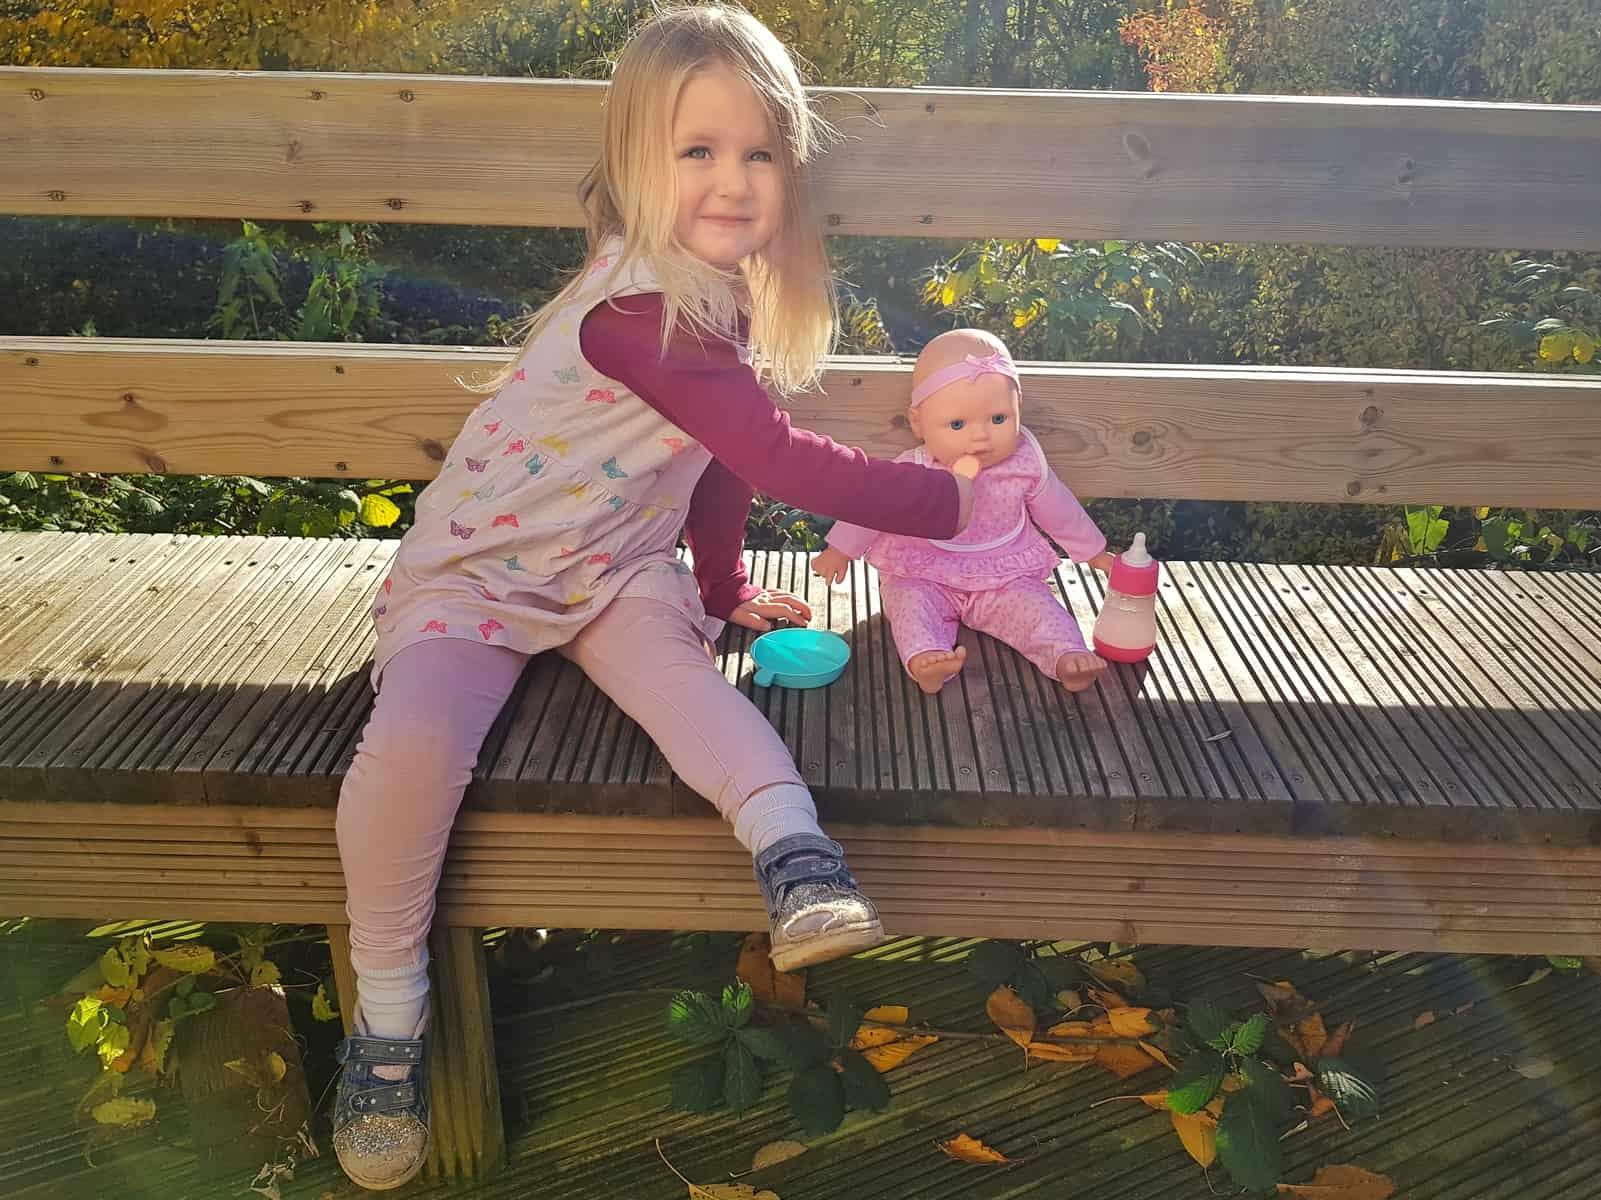 3 year old girl feeding food to doll